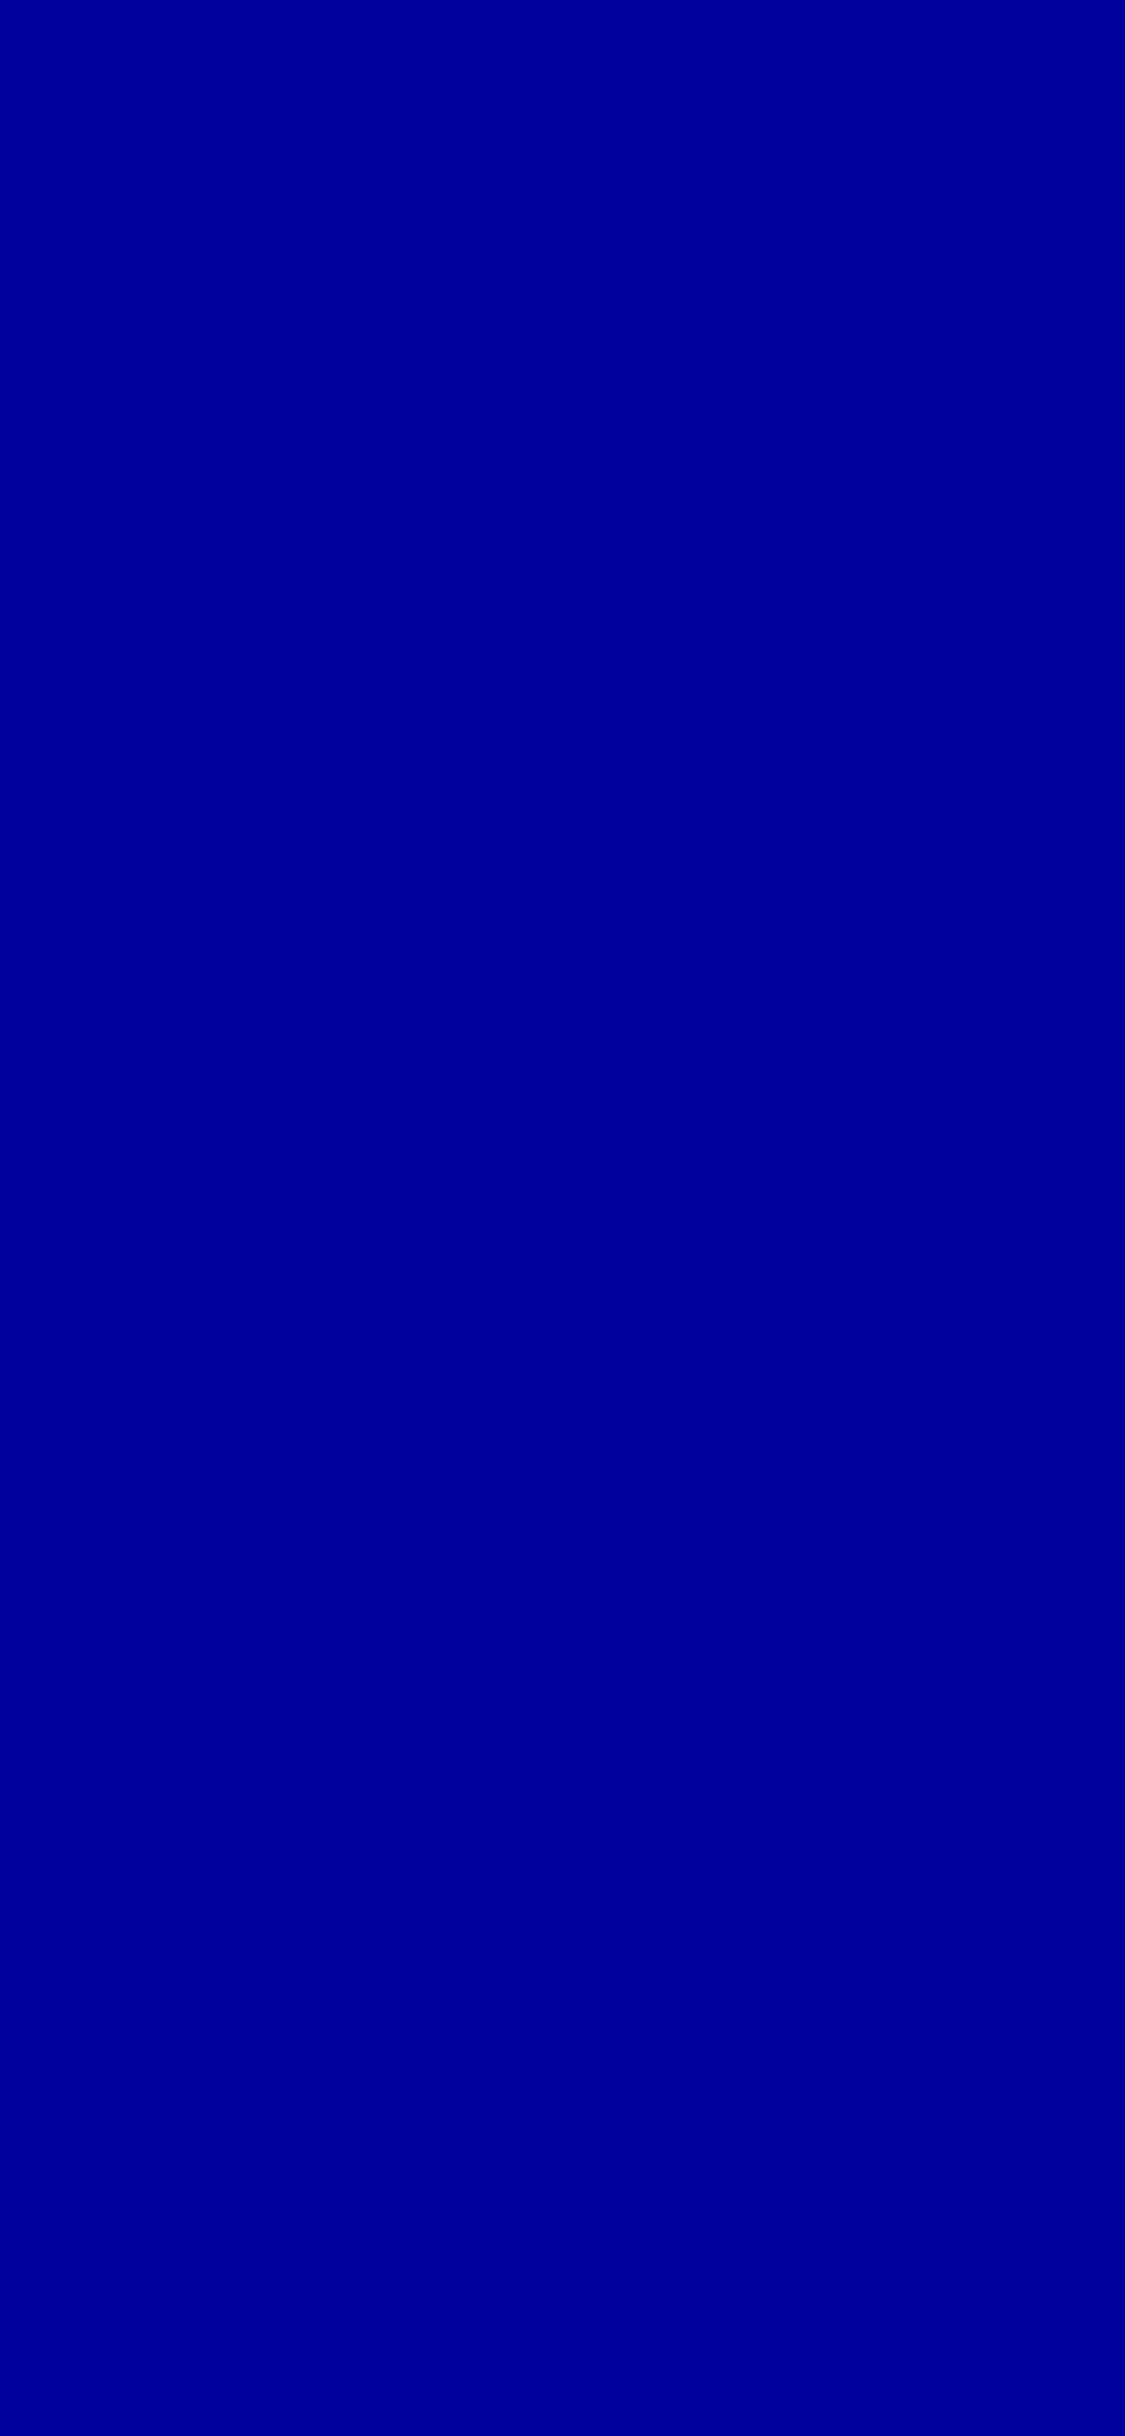 1125x2436 Duke Blue Solid Color Background